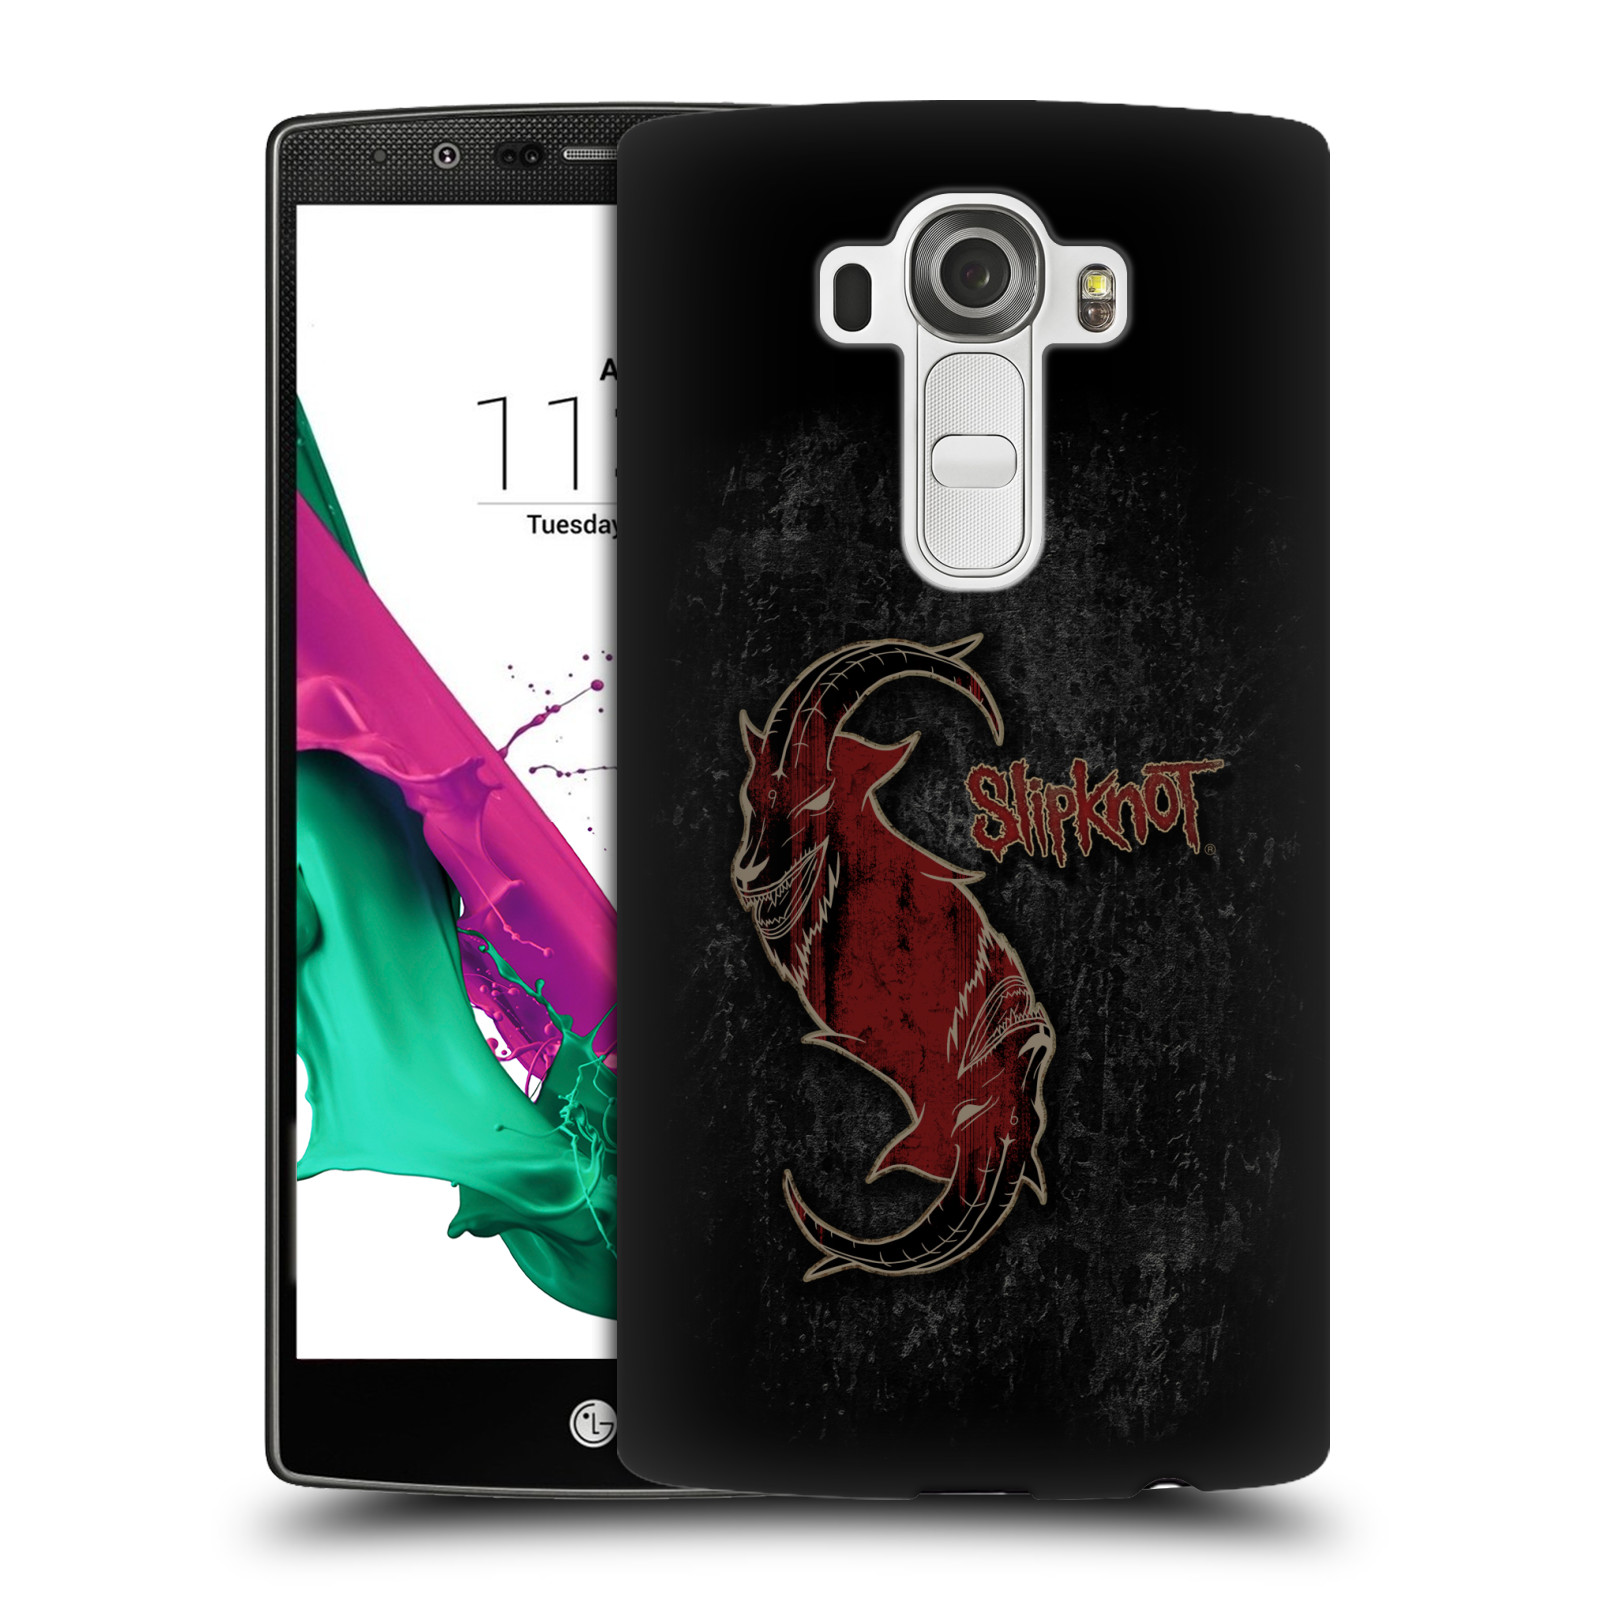 Plastové pouzdro na mobil LG G4 HEAD CASE Slipknot - Rudý kozel